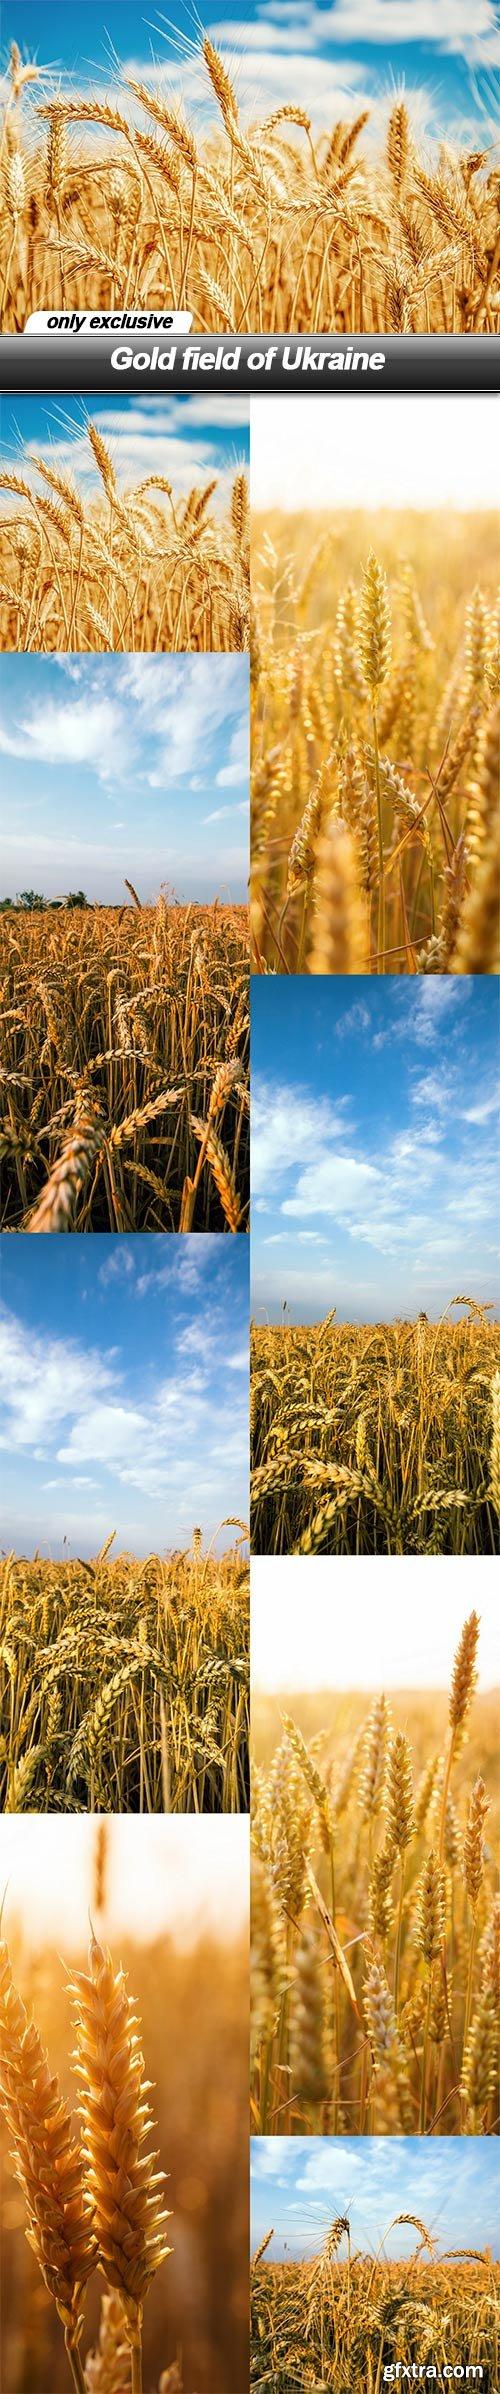 Gold field of Ukraine - 8 UHQ JPEG